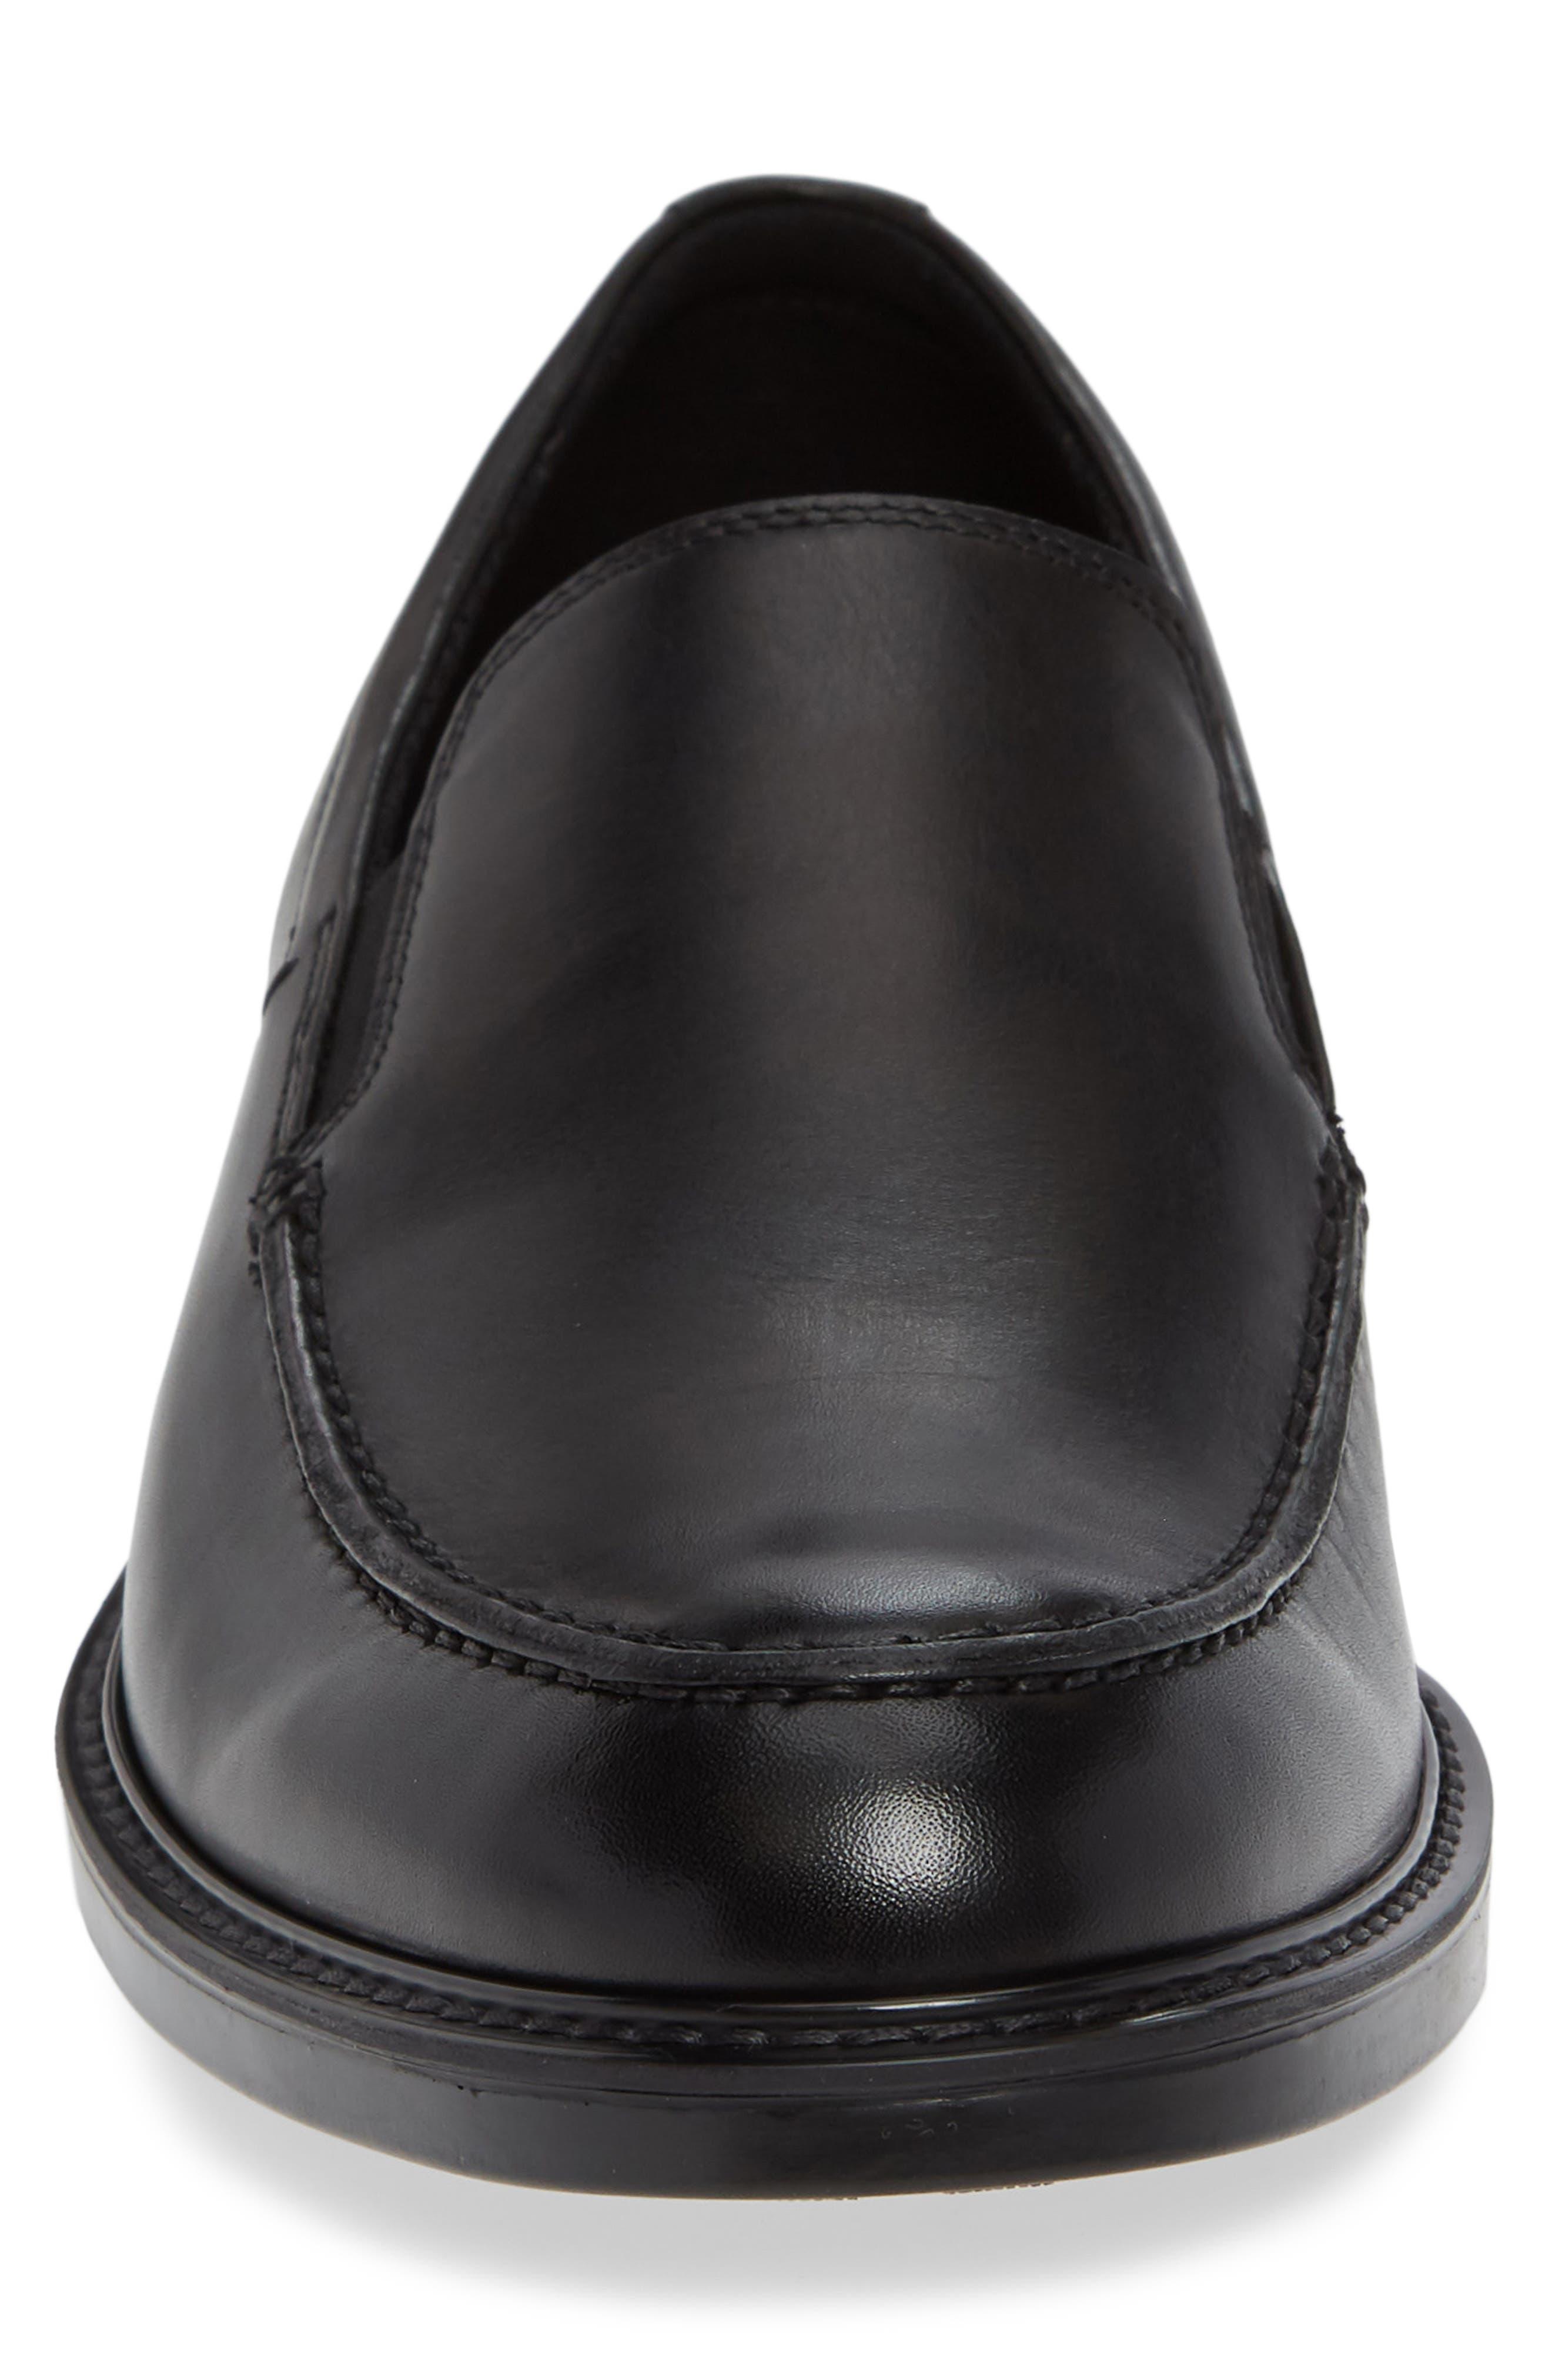 ECCO, Vitrus<sup>™</sup> III Moc Toe Loafer, Alternate thumbnail 4, color, BLACK LEATHER